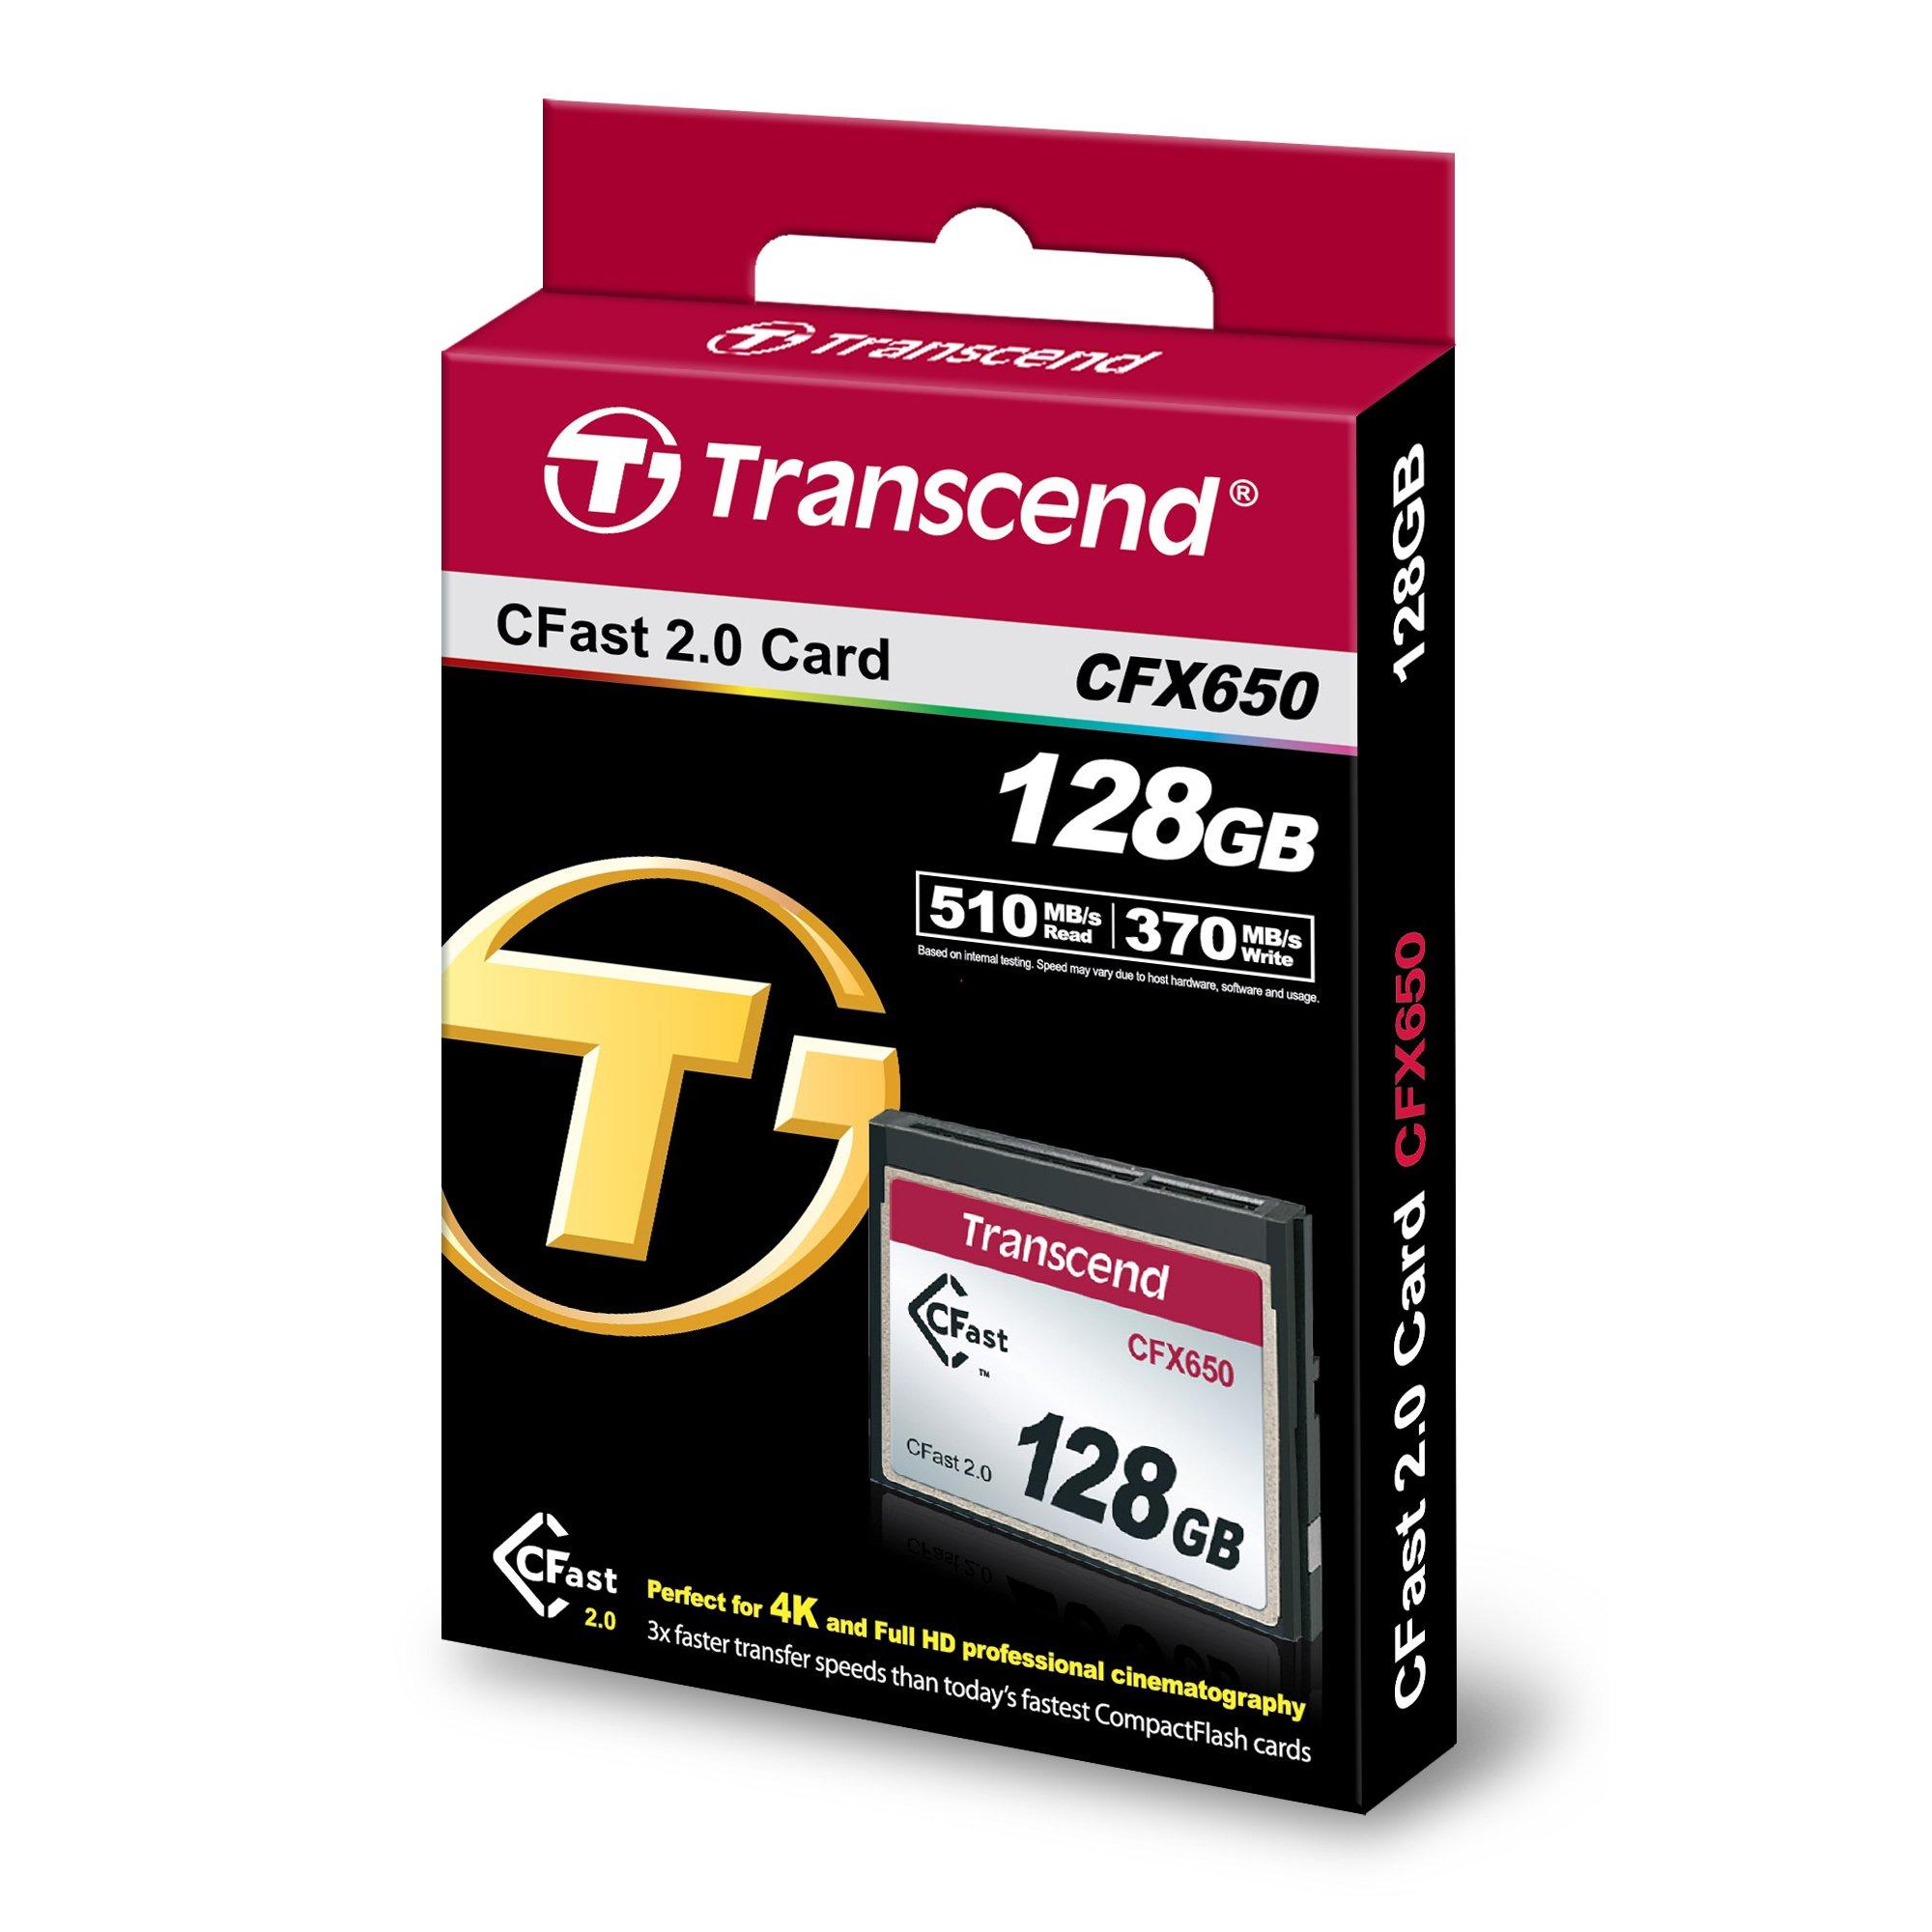 Transcend 128GB, CFast2.0, SATA3, SLC Mode - TS128GCFX650